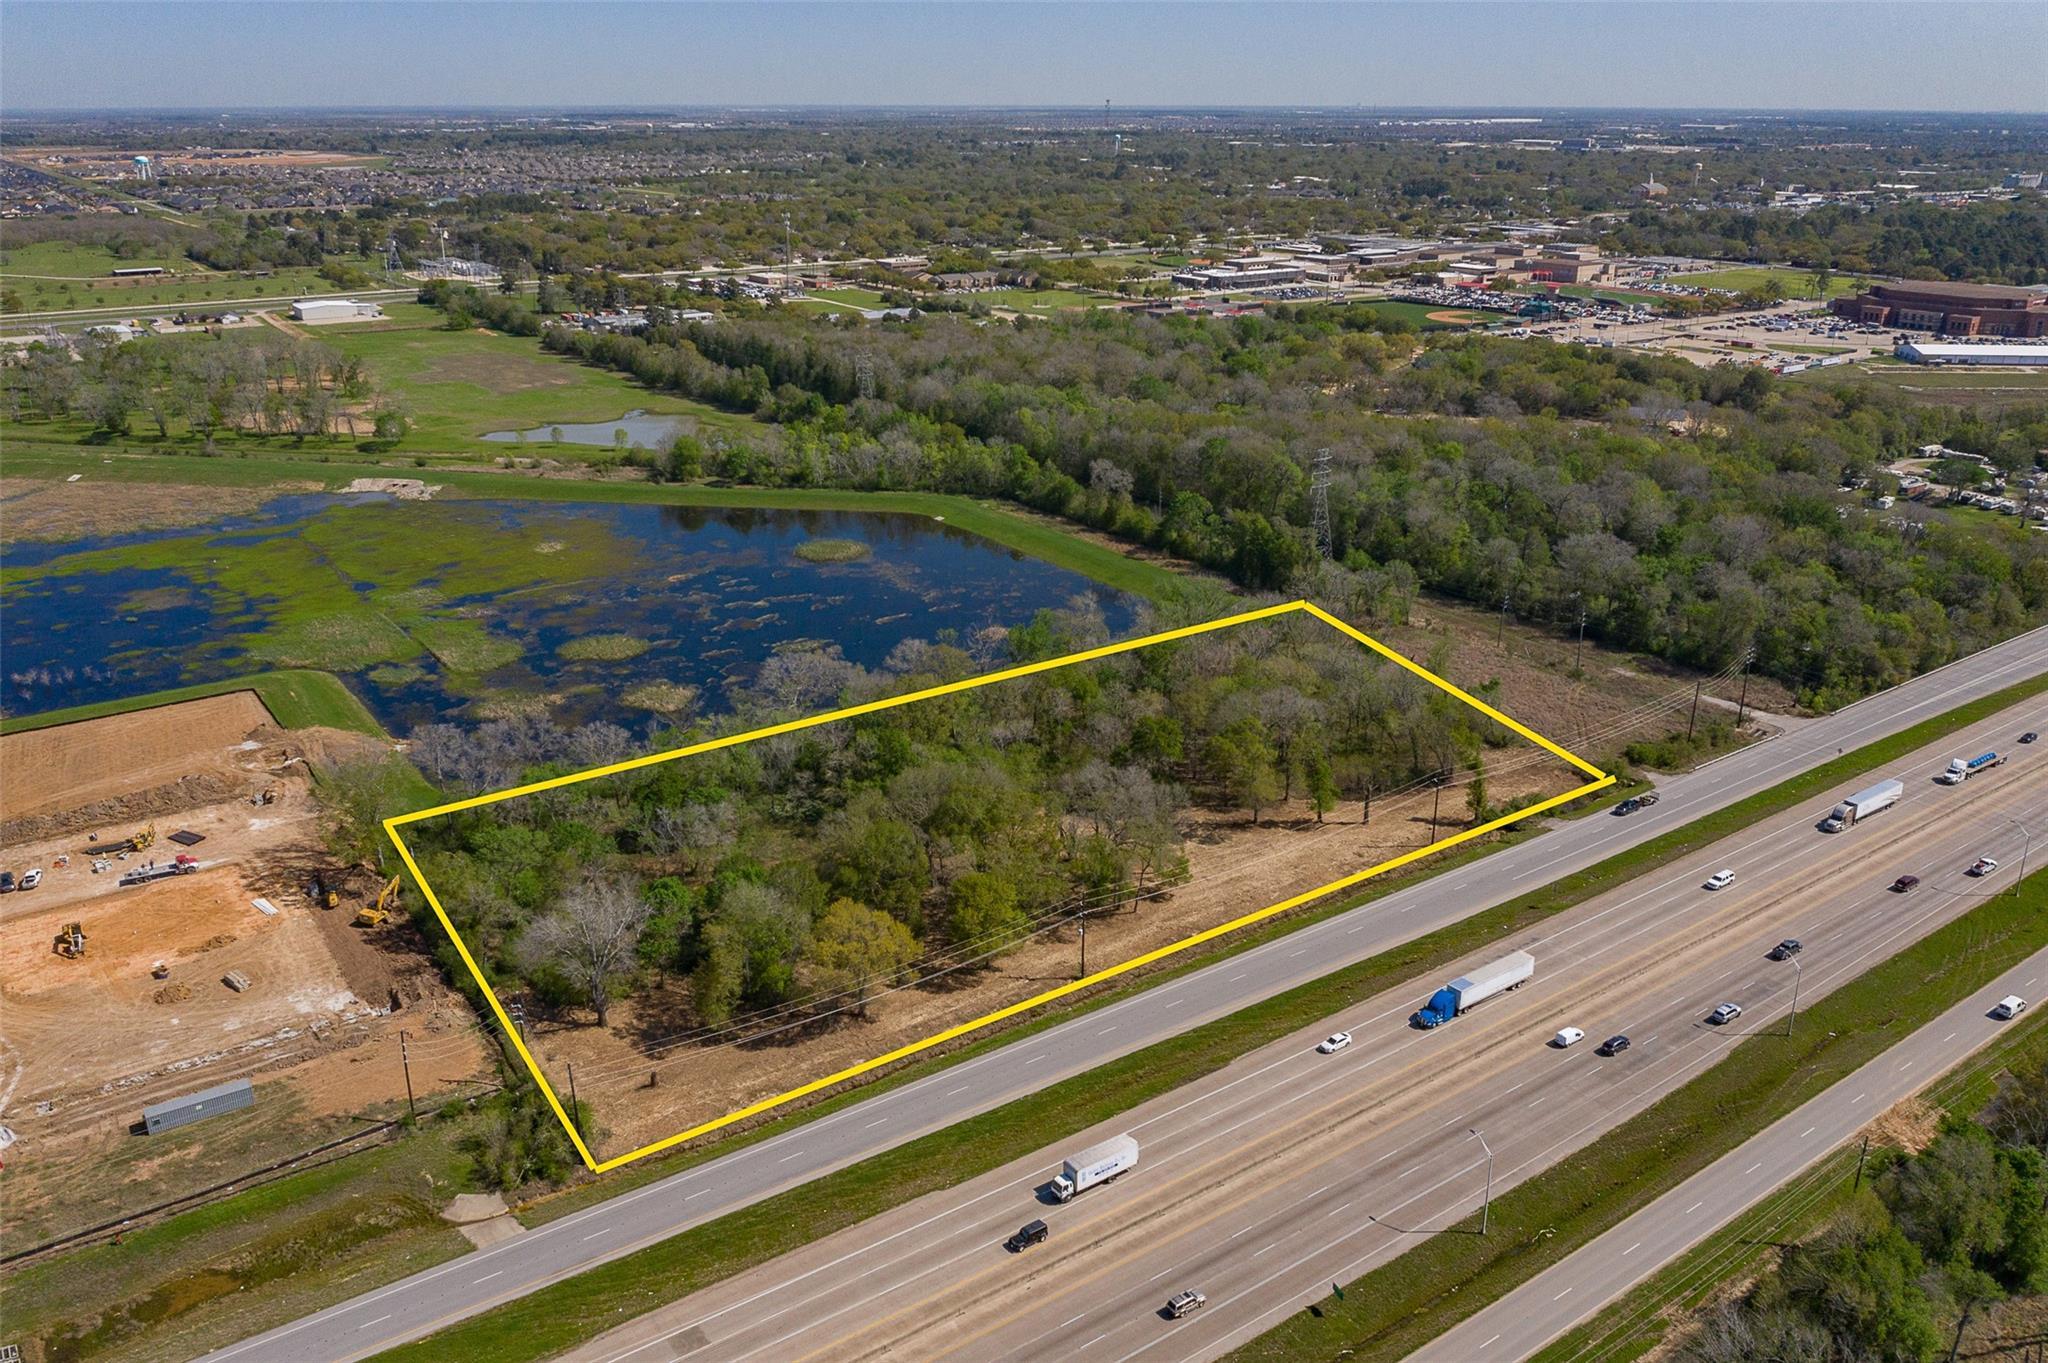 00 Katy Freeway Property Photo - Katy, TX real estate listing